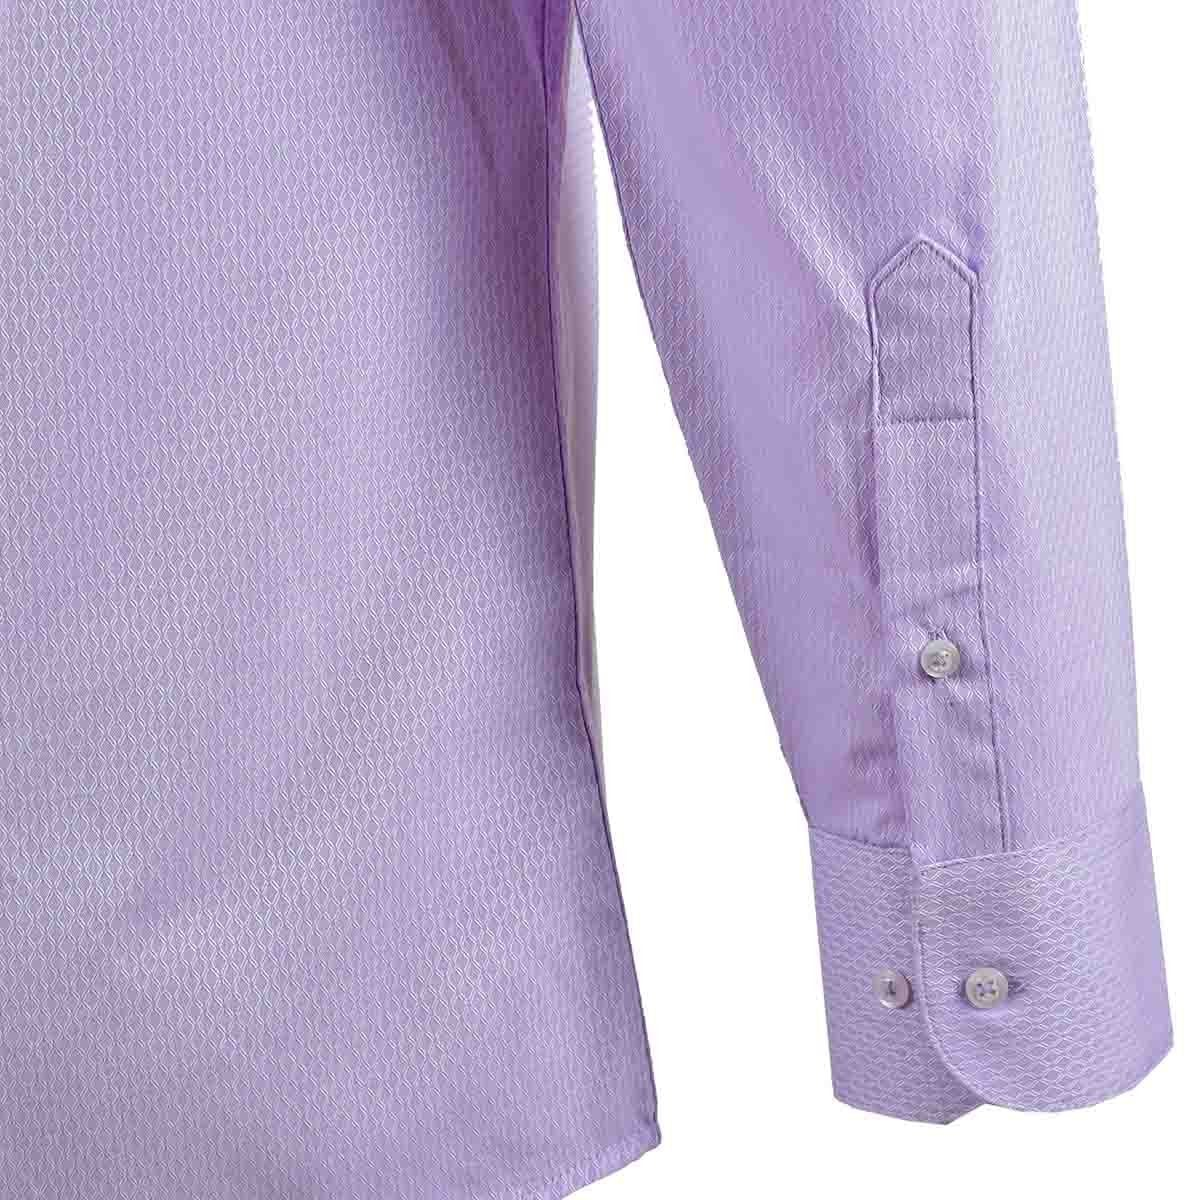 Camisa de Vestir Manga Larga Morado Claro Nina Ricci para Caballero